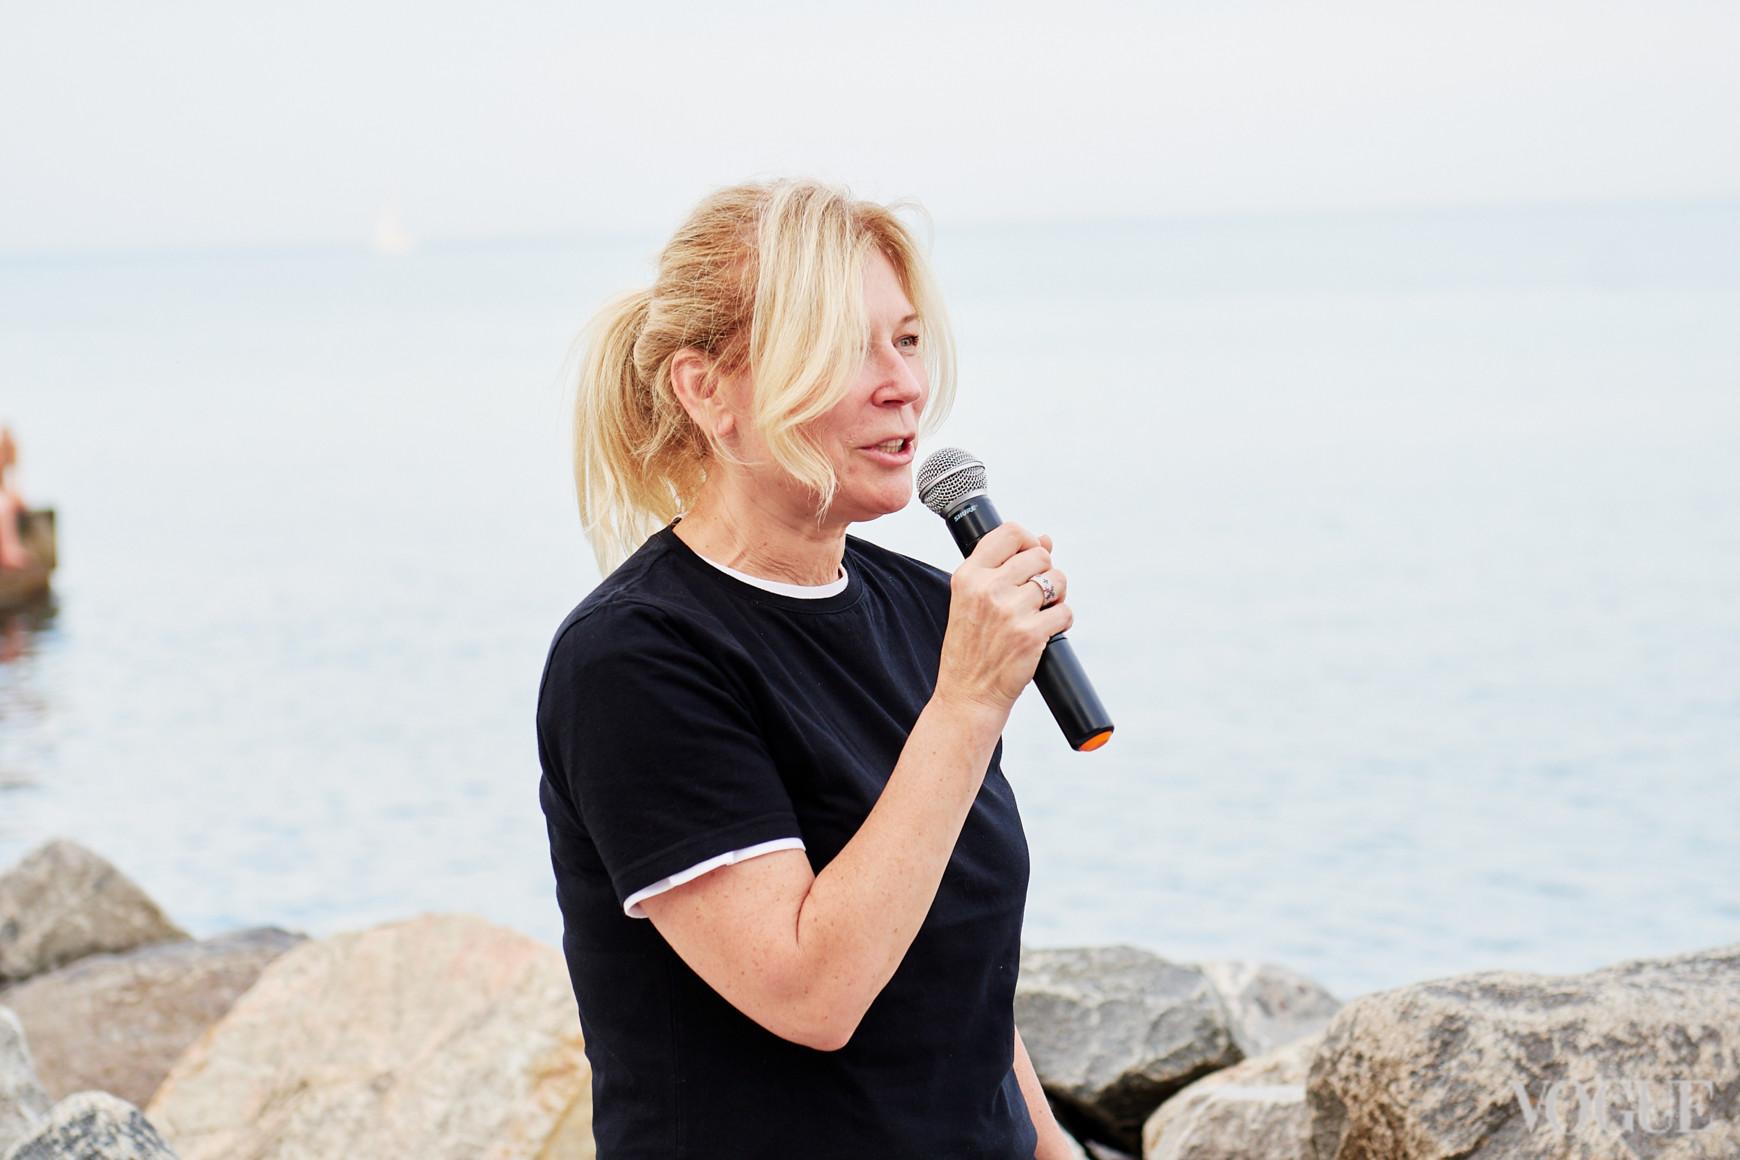 Глава жюри, дизайнер Лилия Пустовит